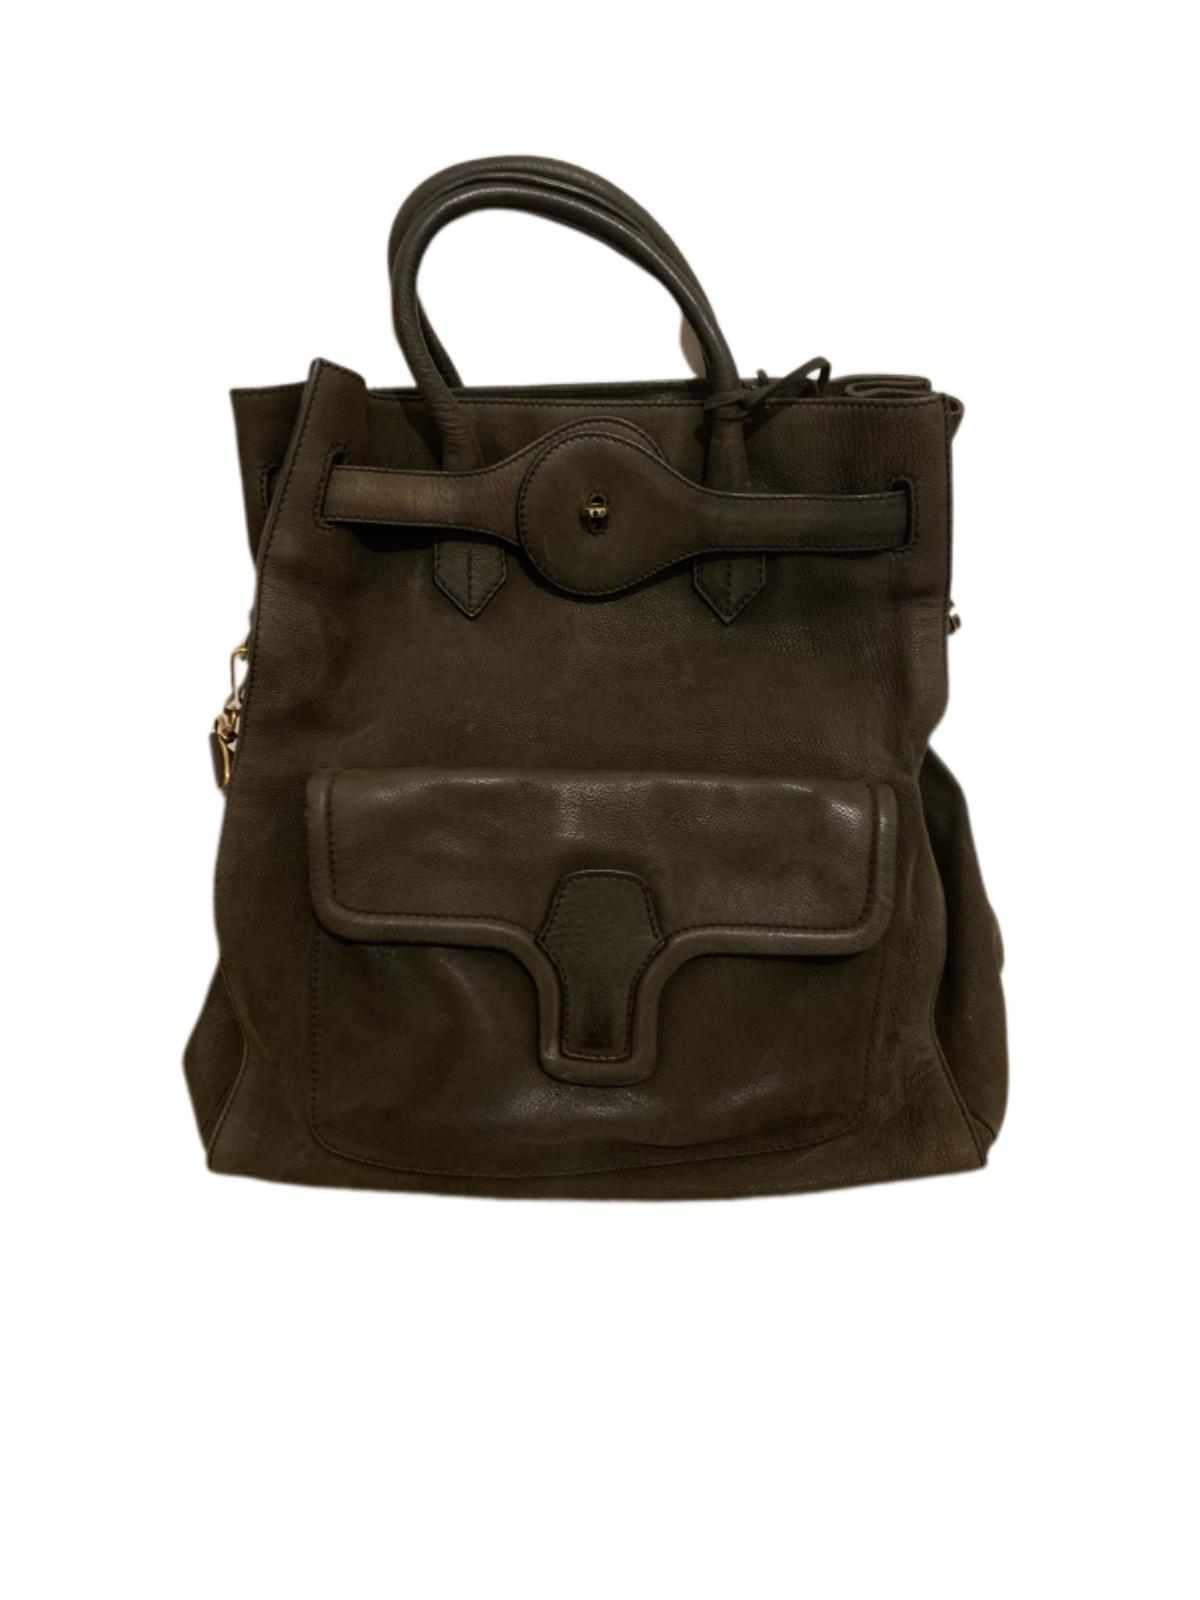 Buy: Day Bag